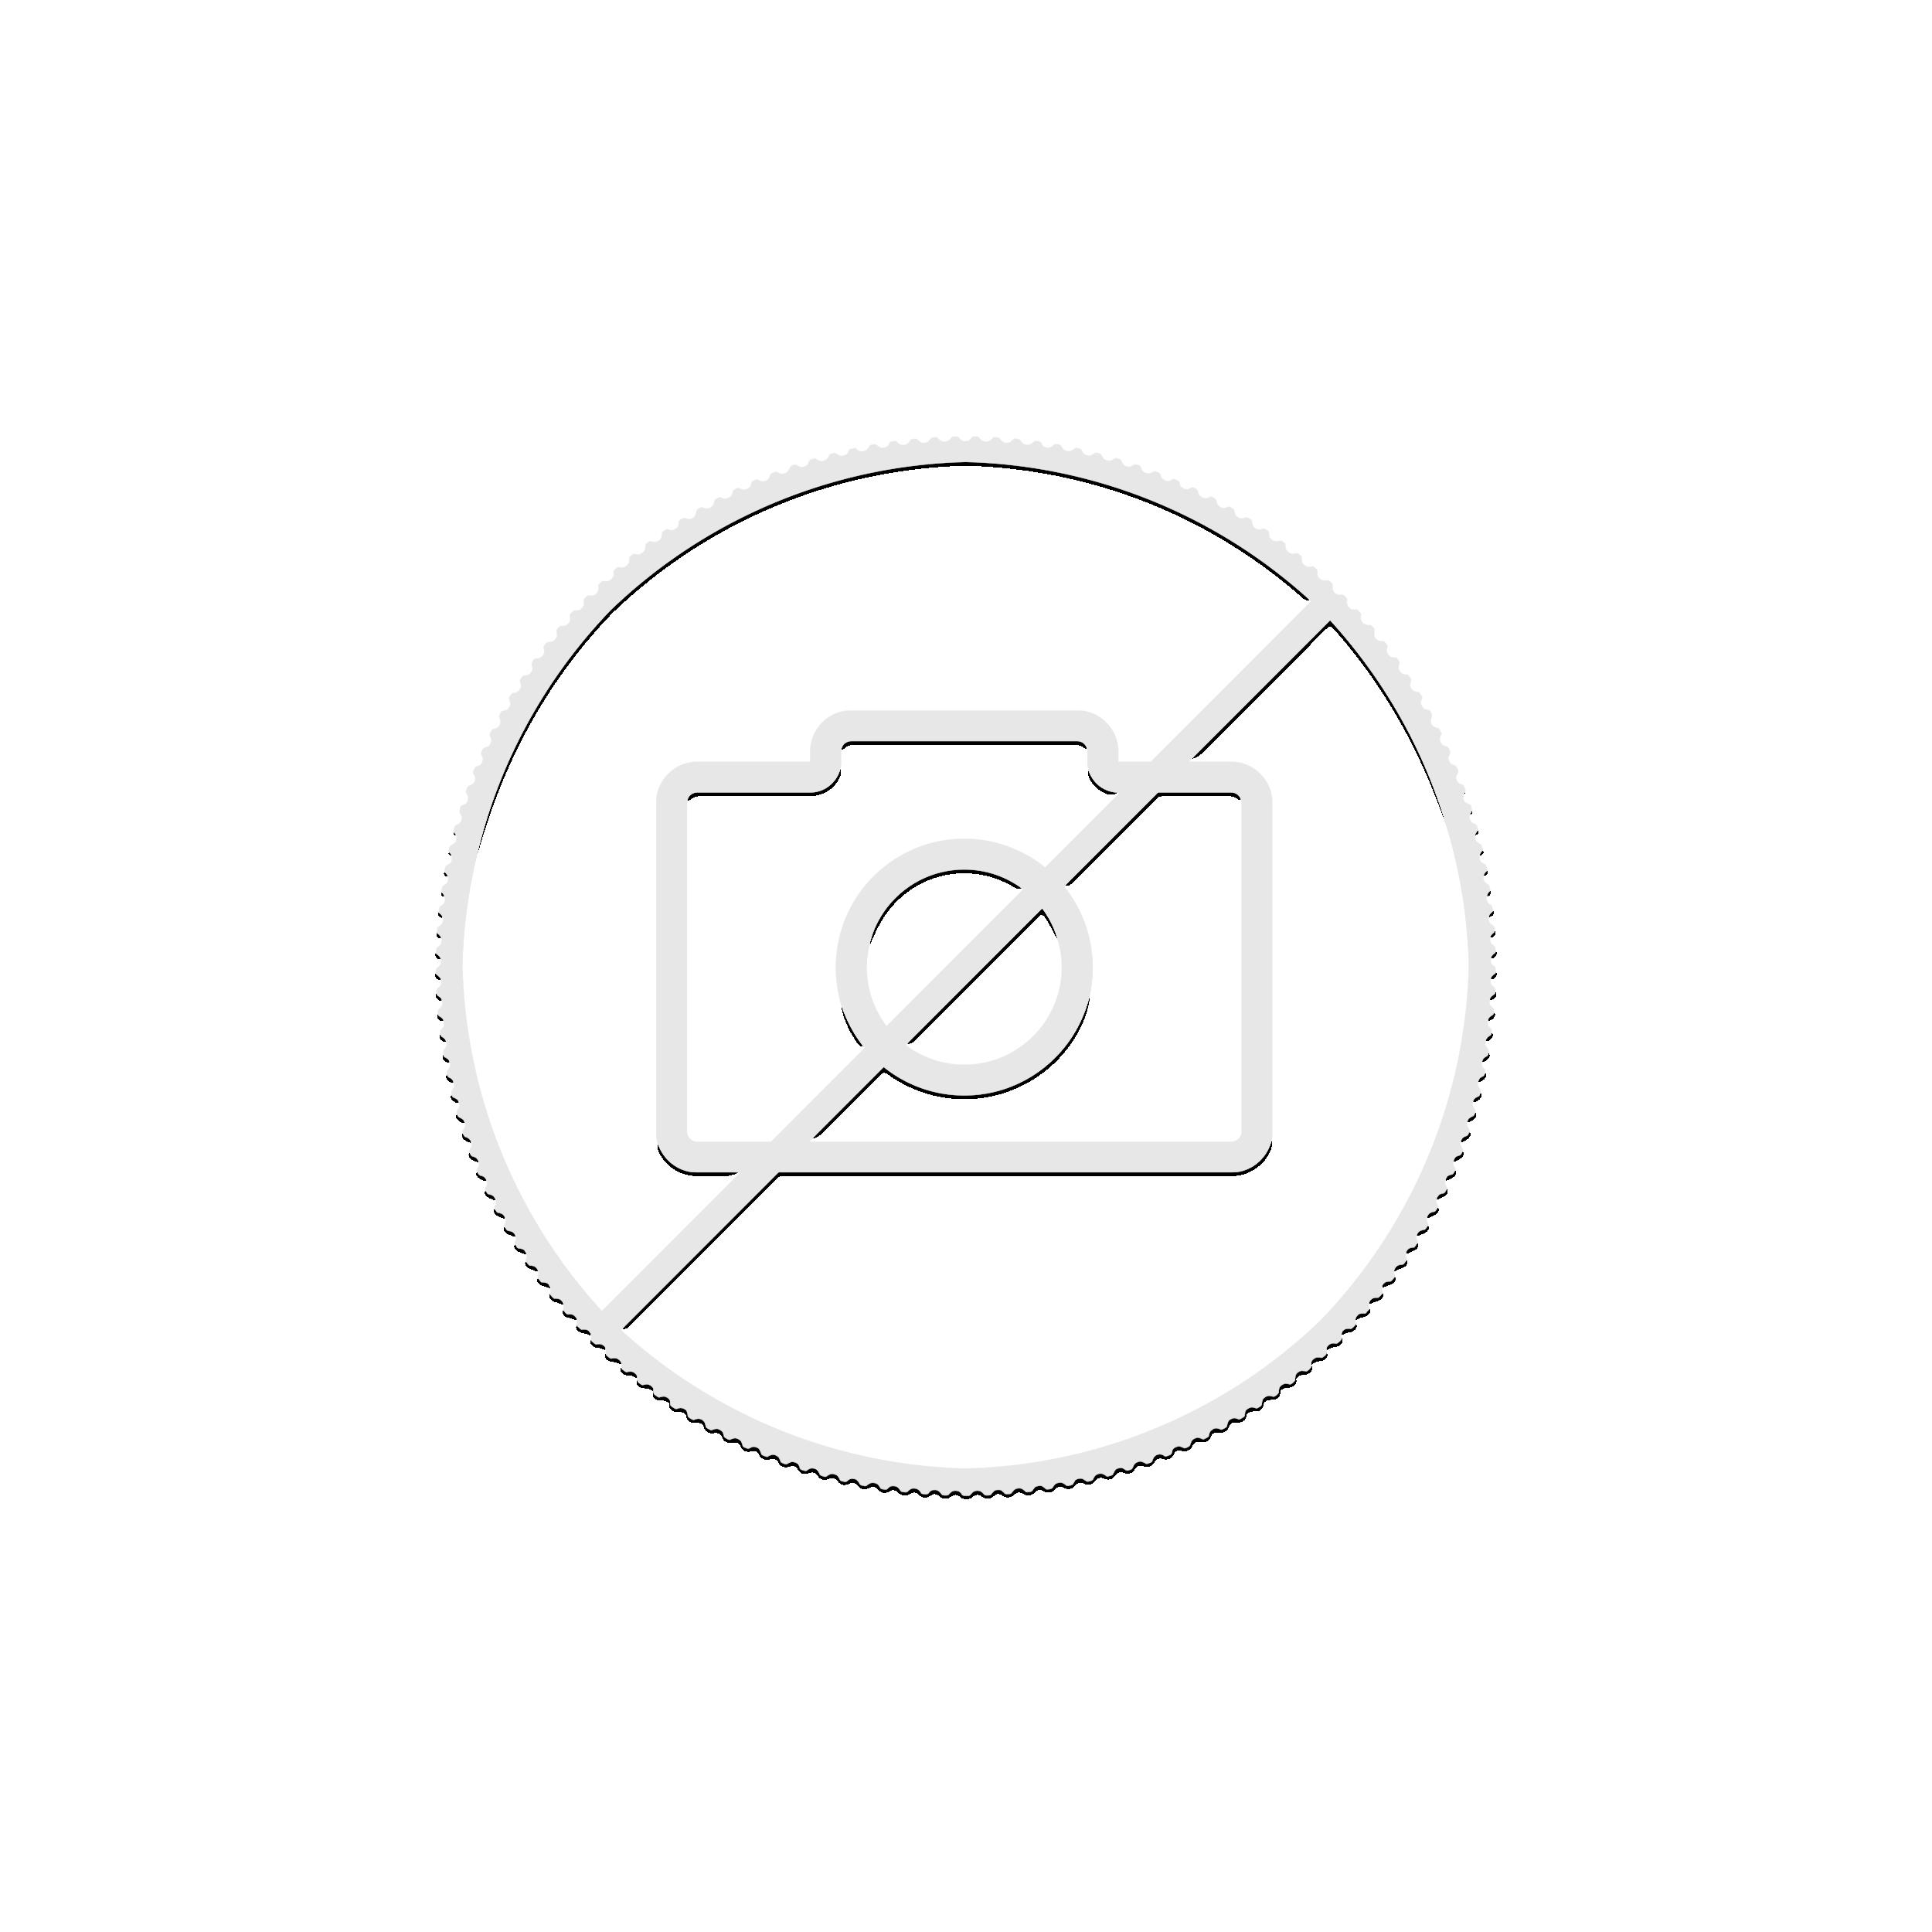 10 troy ounce zilveren Britannia munt 2021